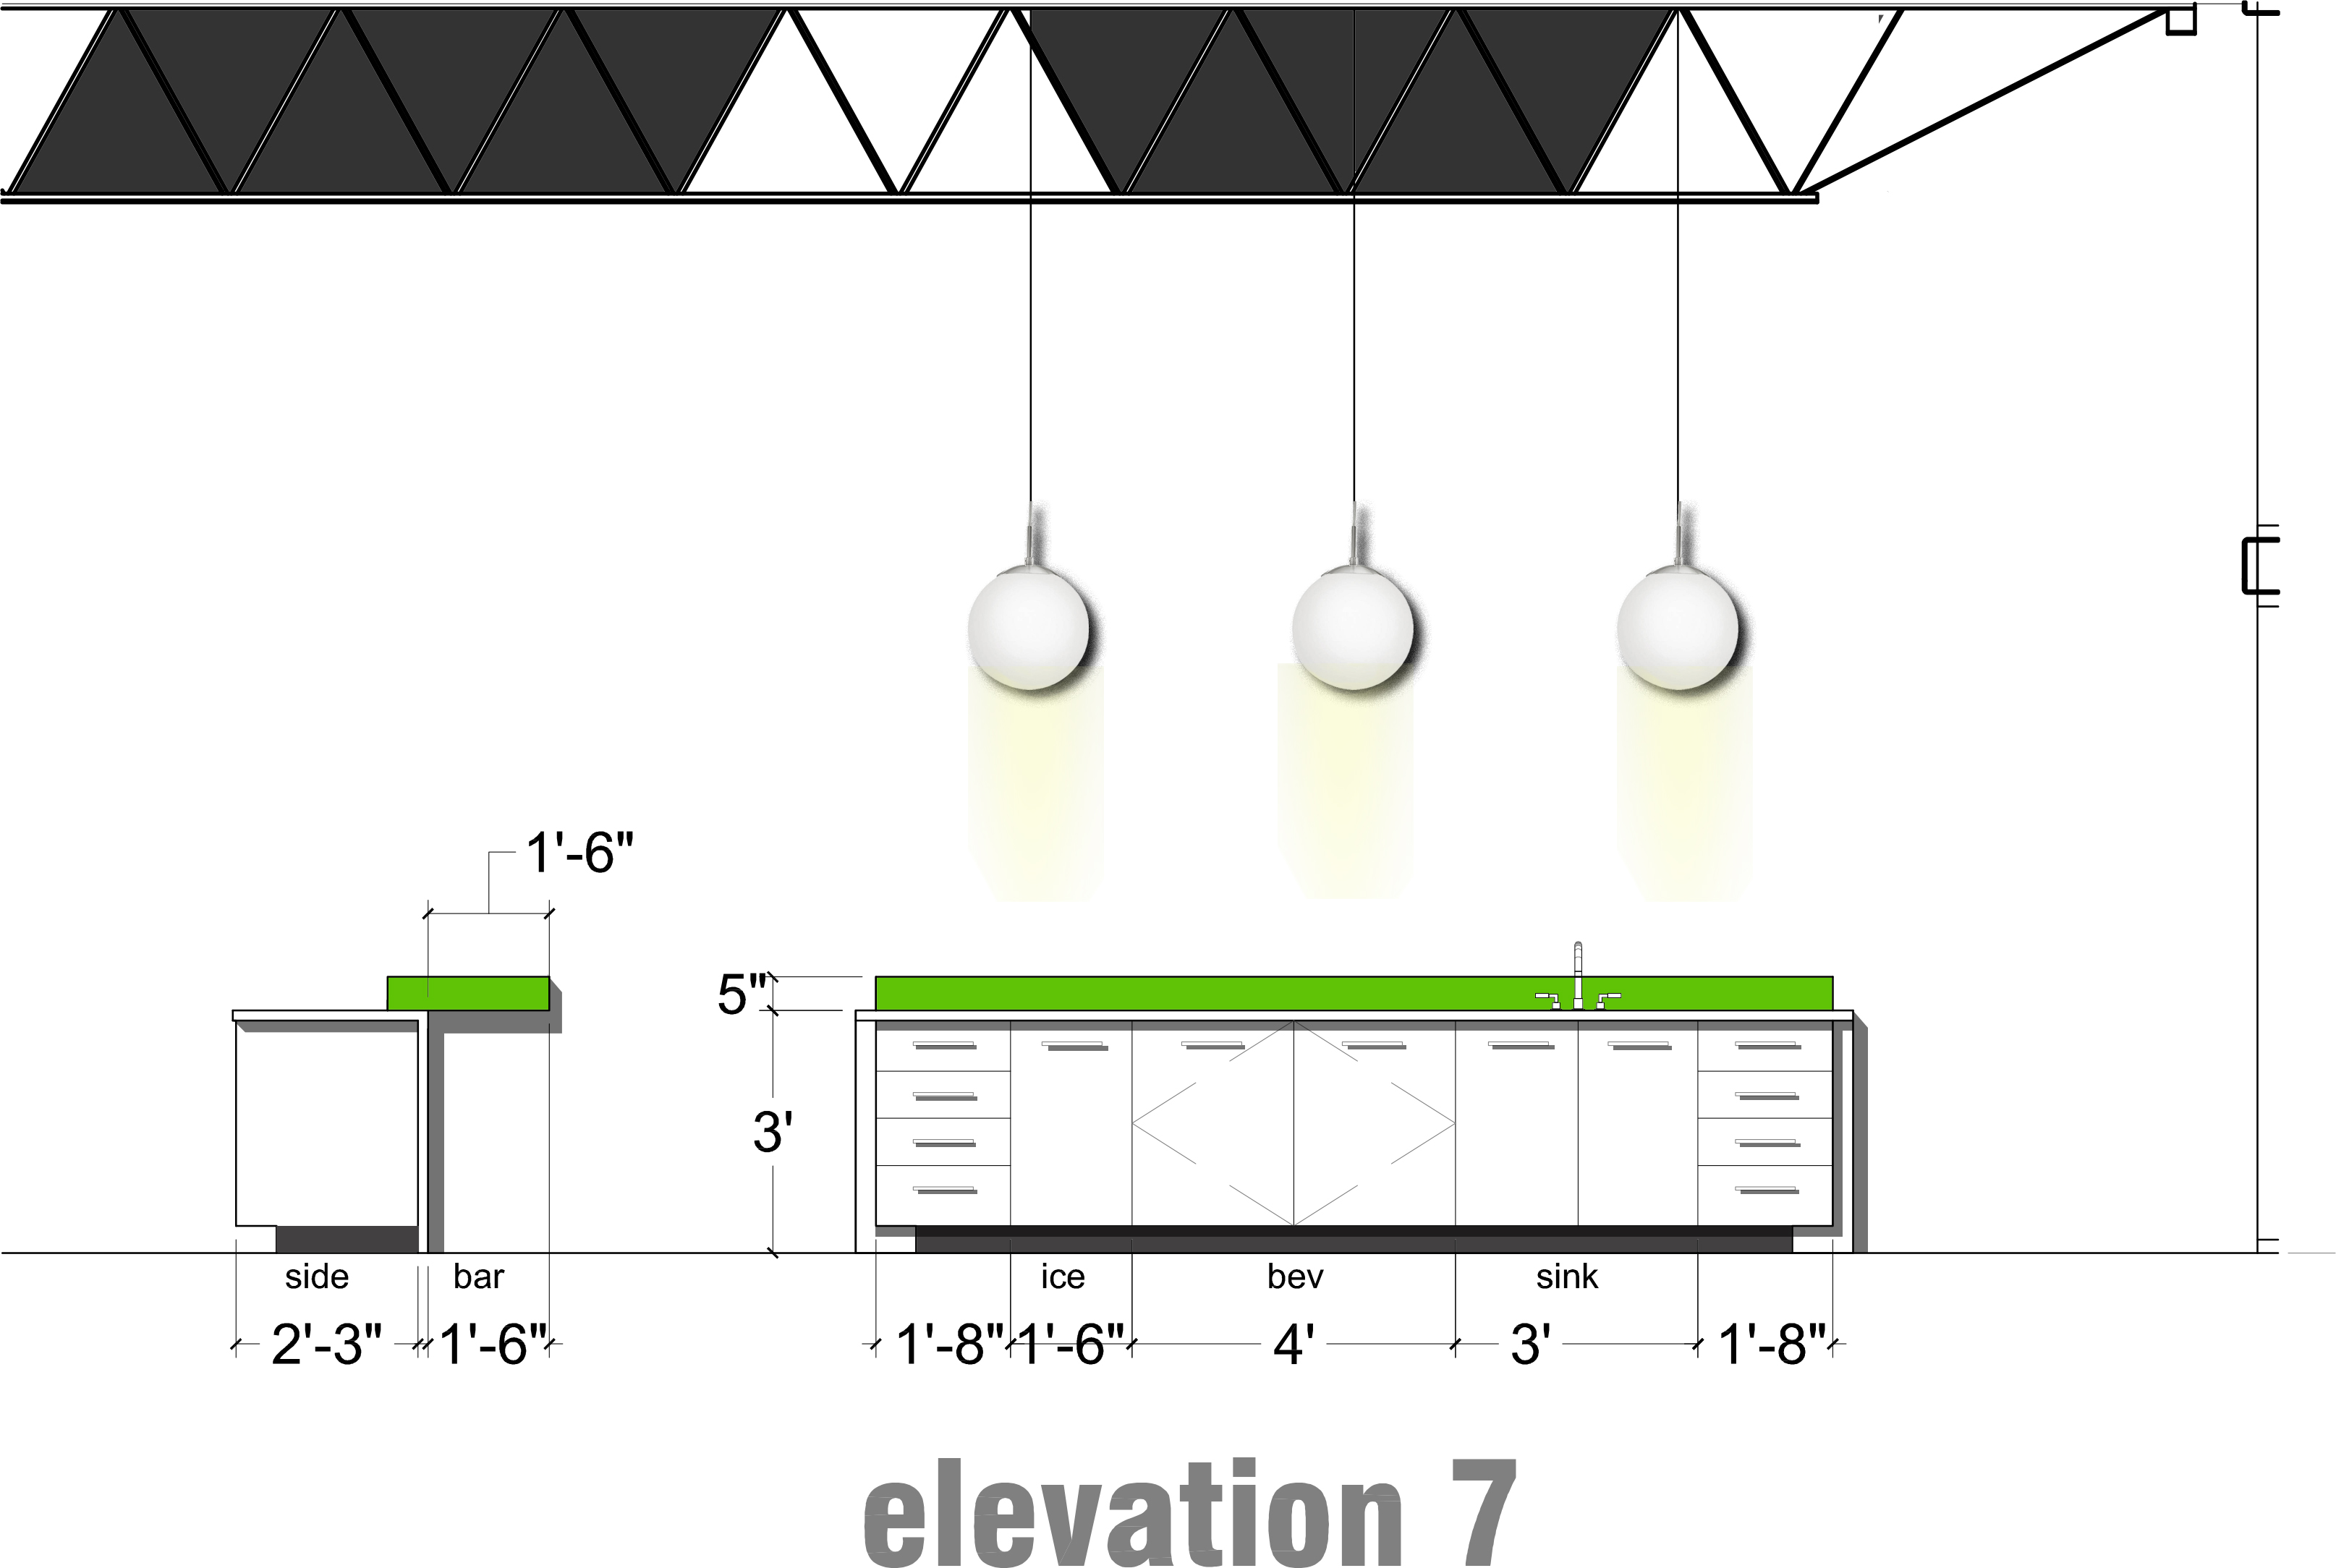 World View Elevation 7